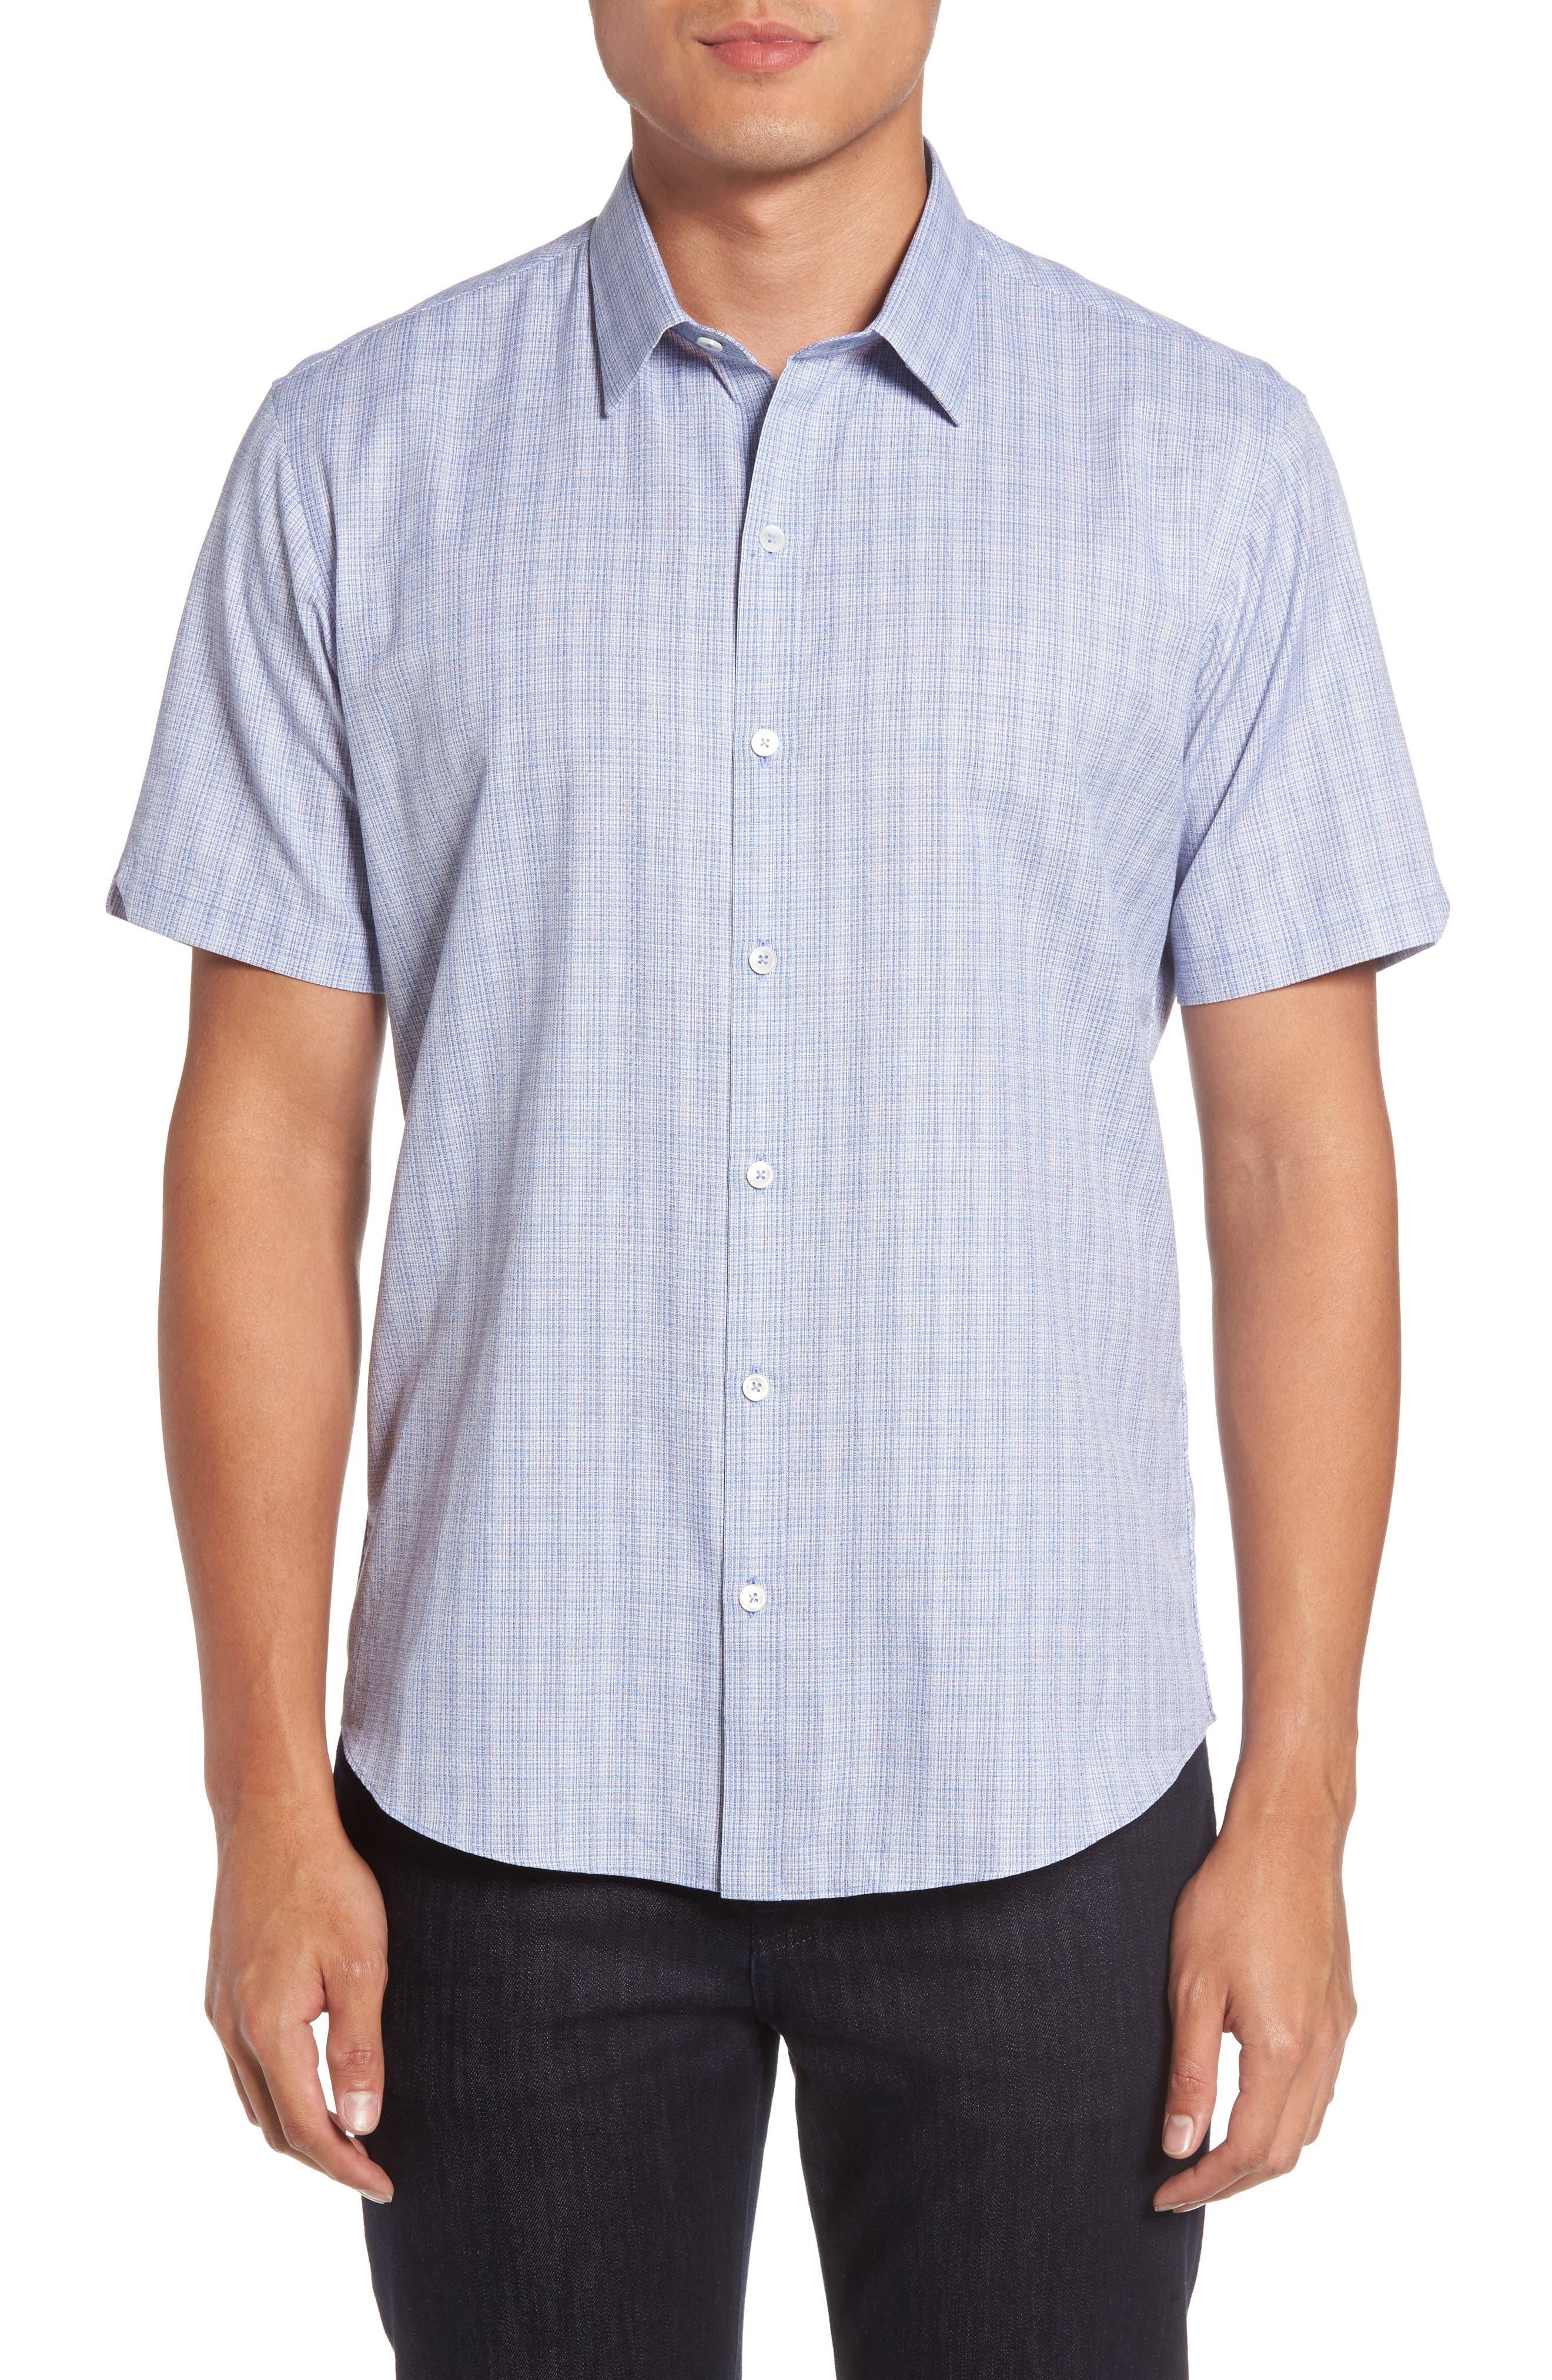 Alternate Image 1 Selected - Zachary Prell Zimmerman Check Sport Shirt